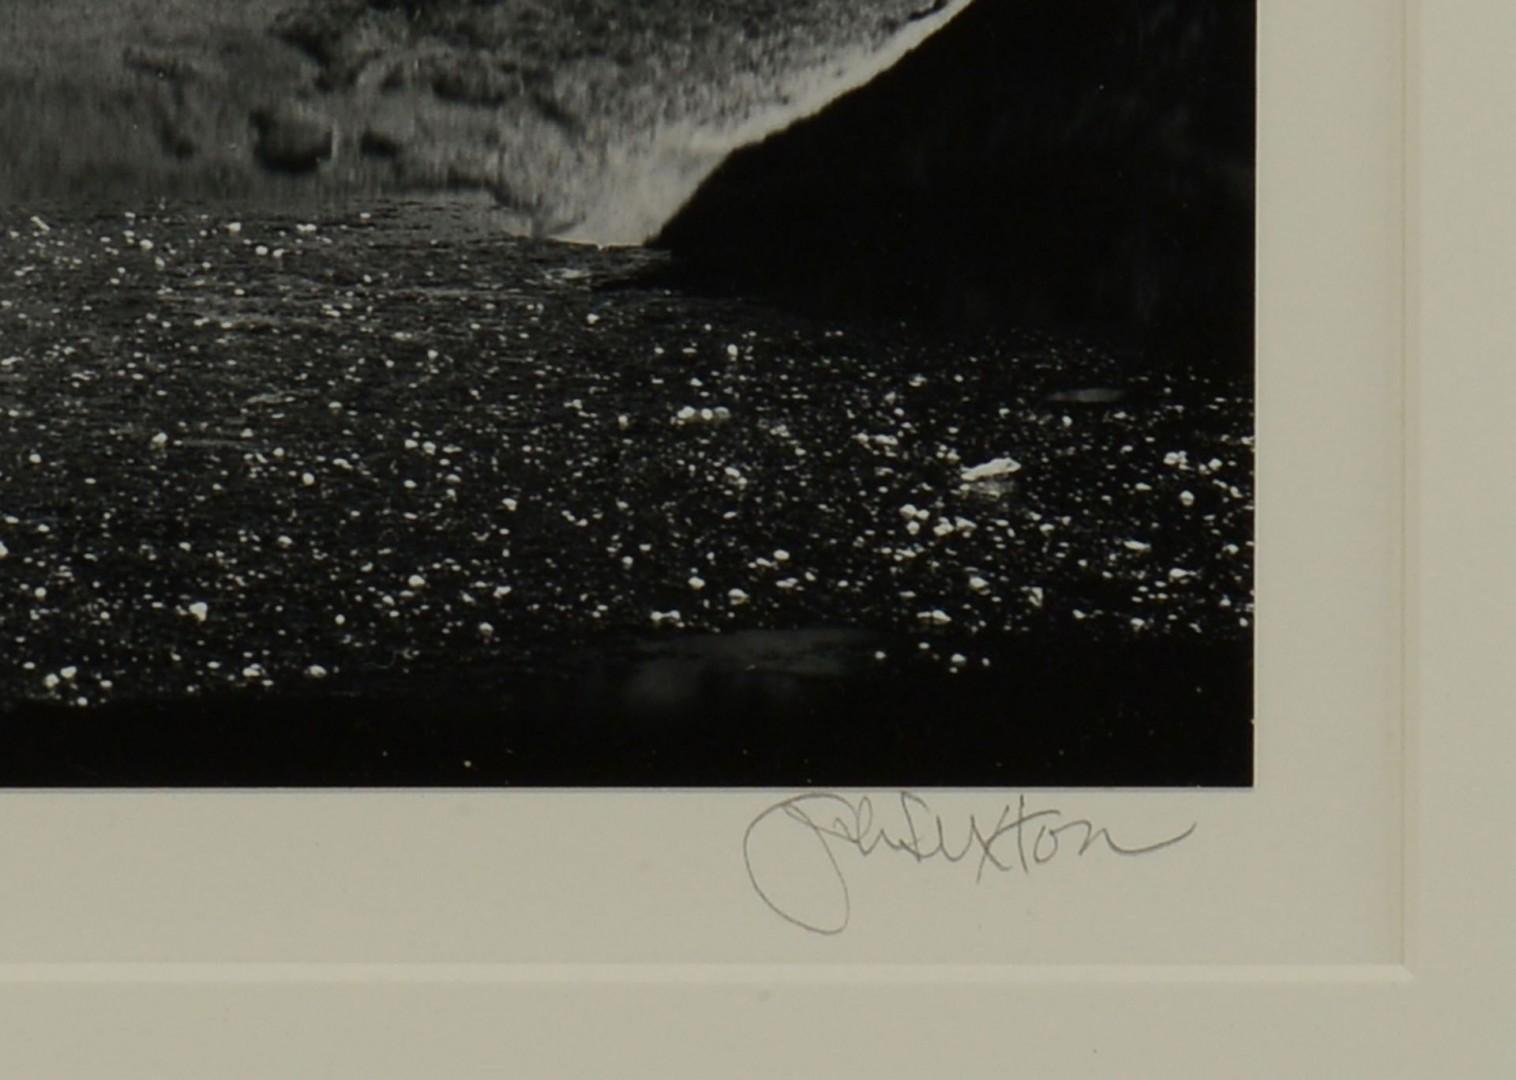 John Sexton Gelatin Silver Print